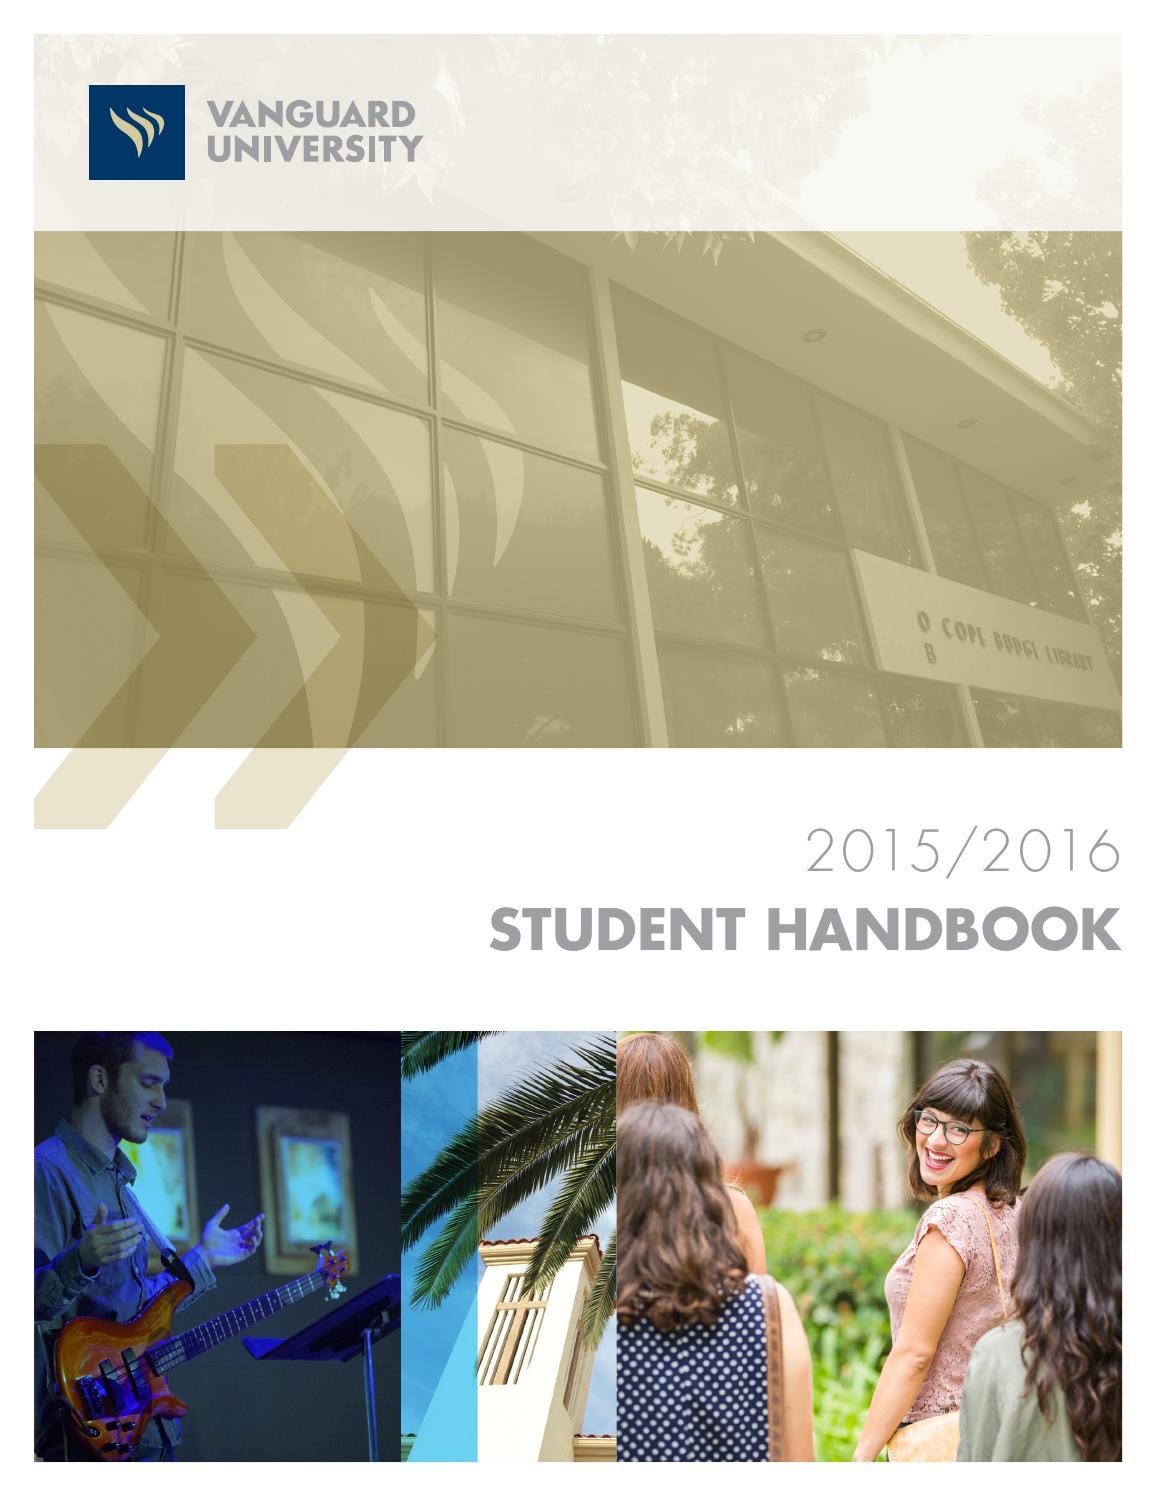 2015 2016 Student Handbook Final 8 11 15 By Vanguard University Issuu